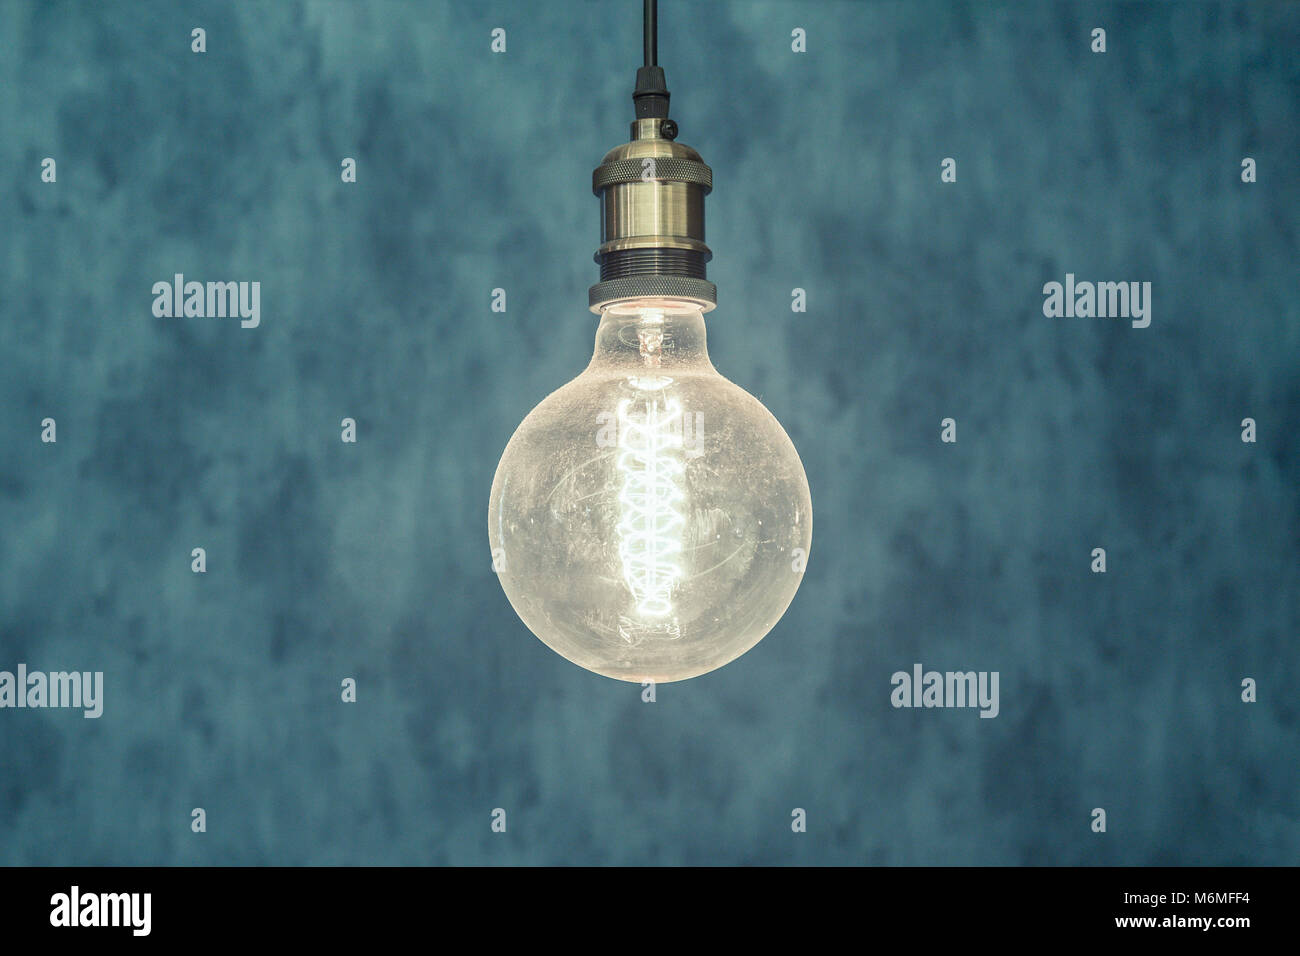 Decorative antique edison style light bulb against blue background. - Stock Image